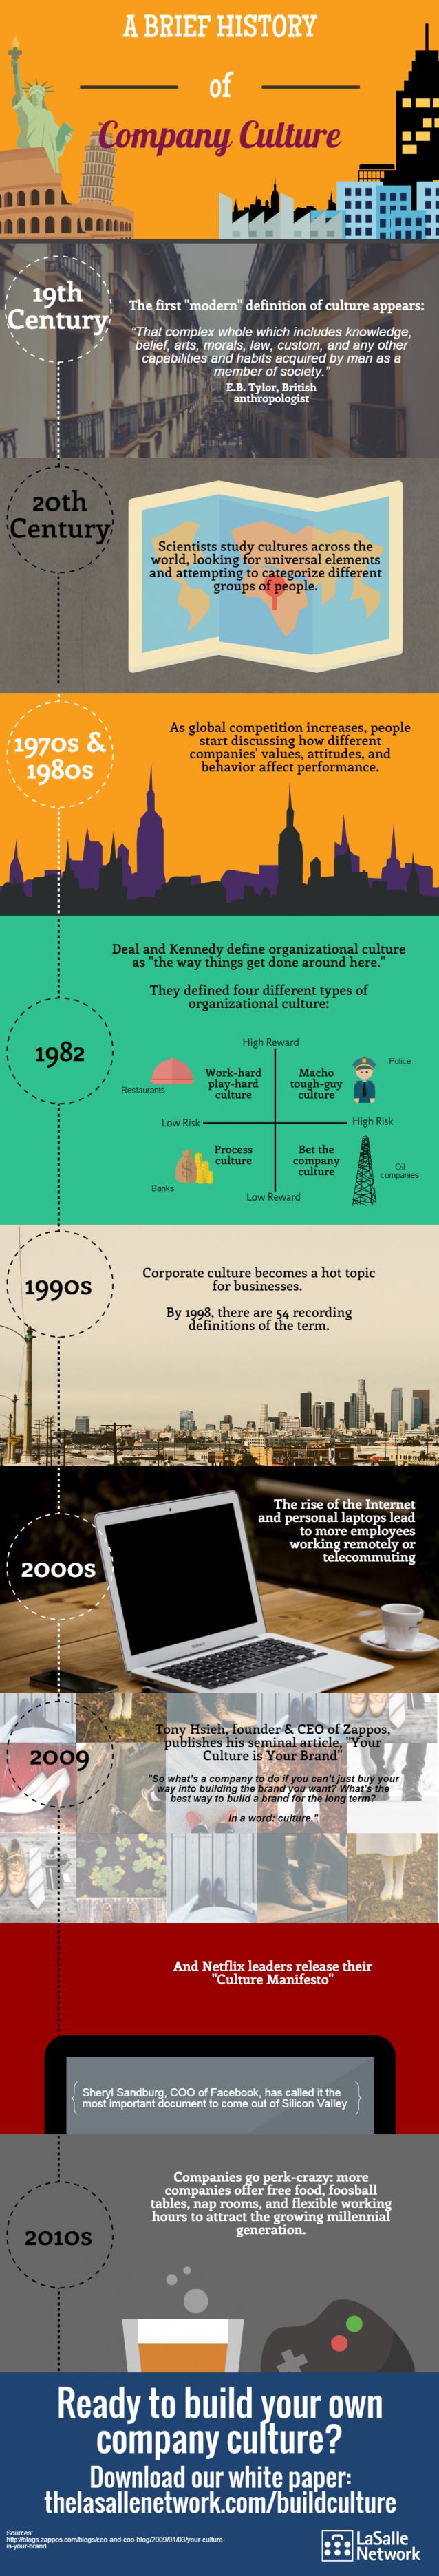 history of company culture lasalle